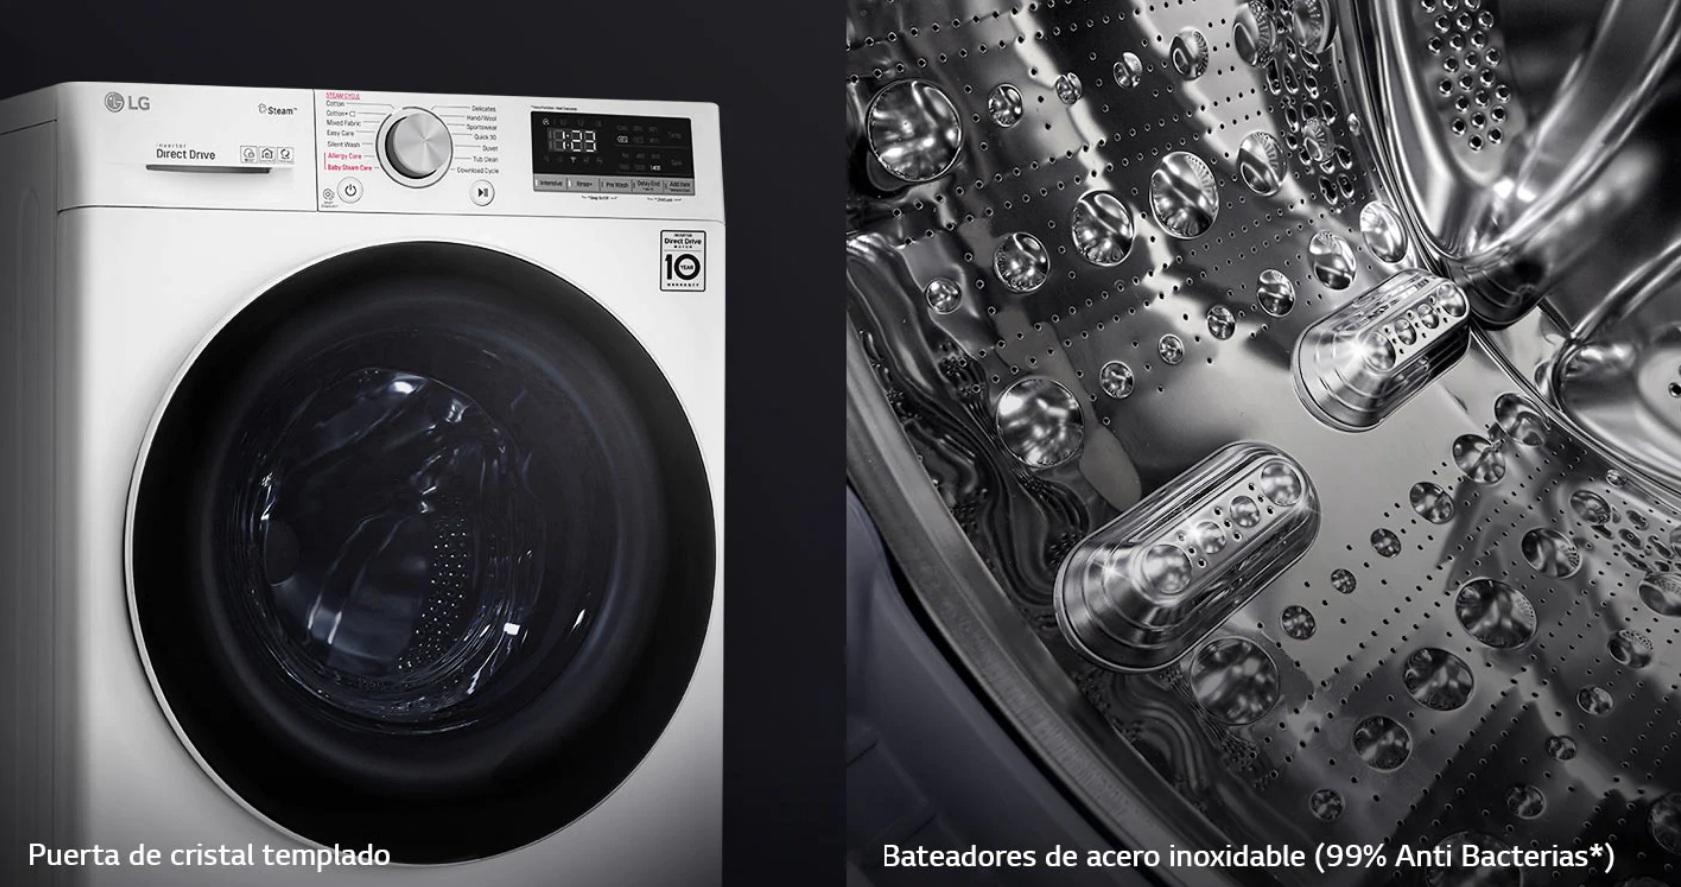 LG F4WV3008N3W - Diseño más higiénico